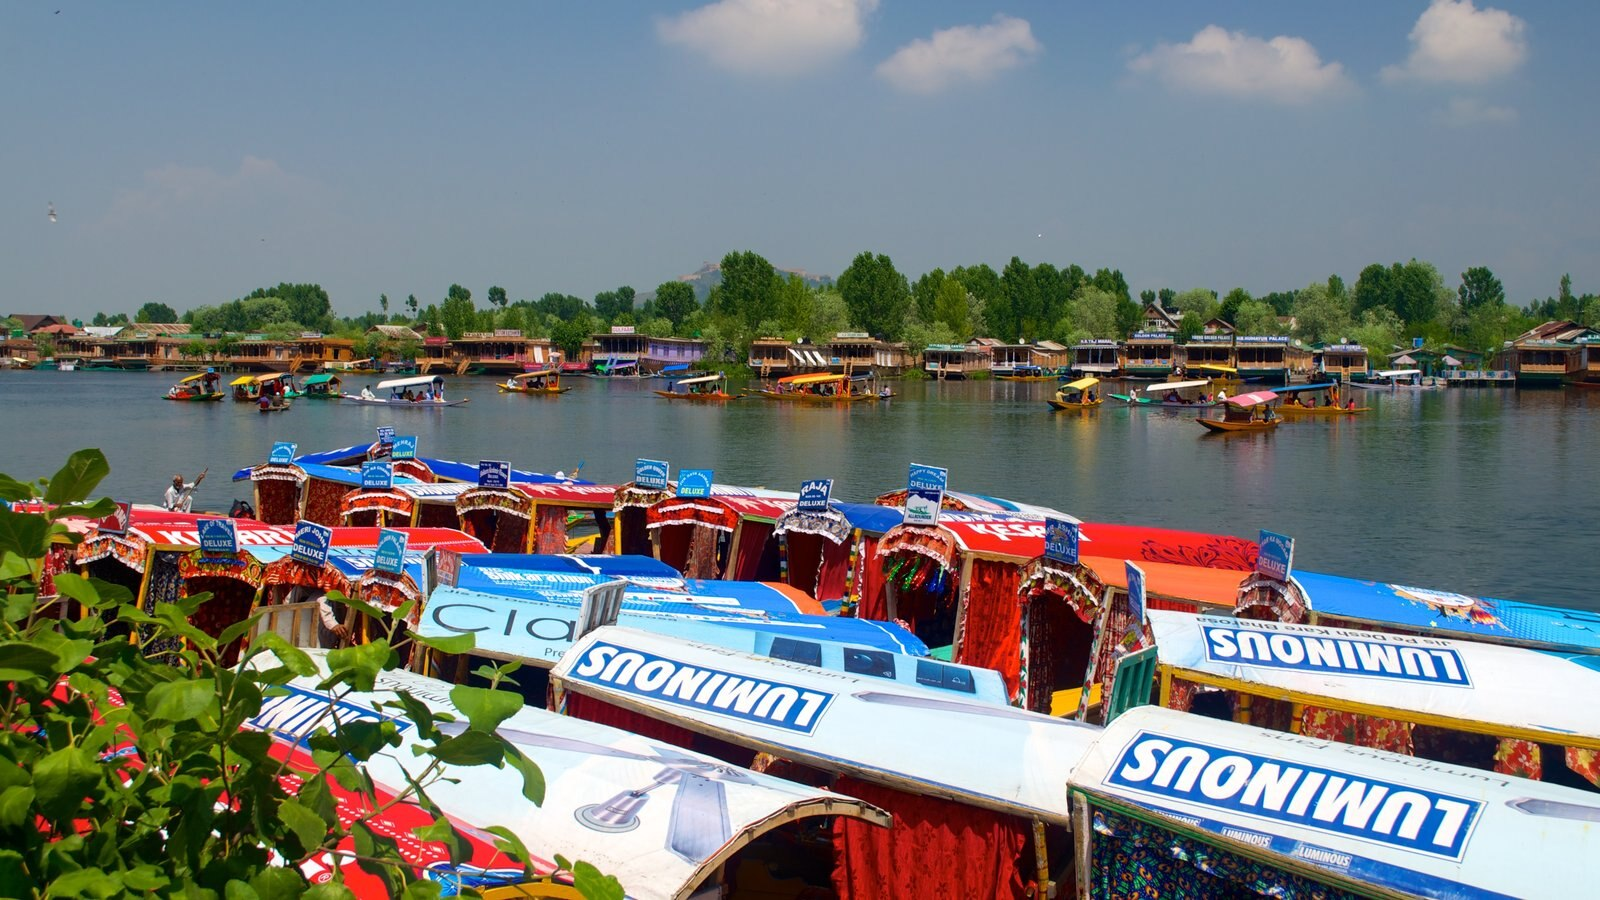 Srinagar featuring a lake or waterhole